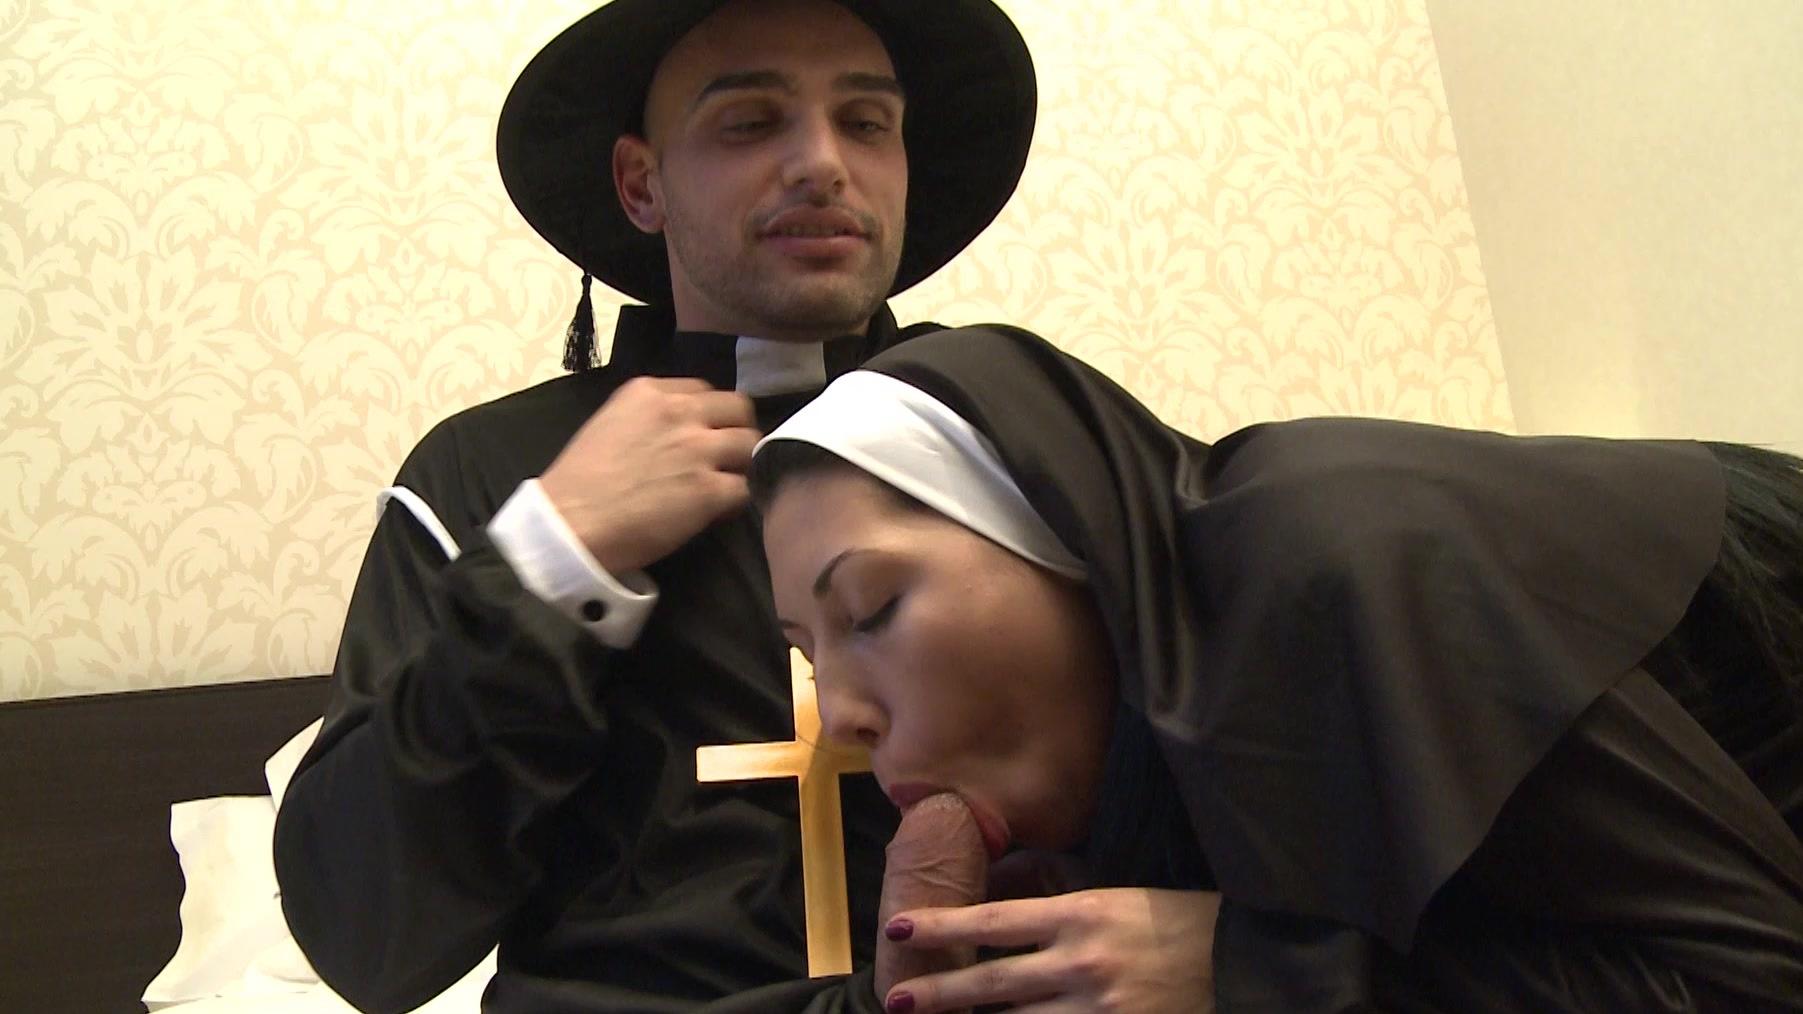 Nuns sucks three cocks